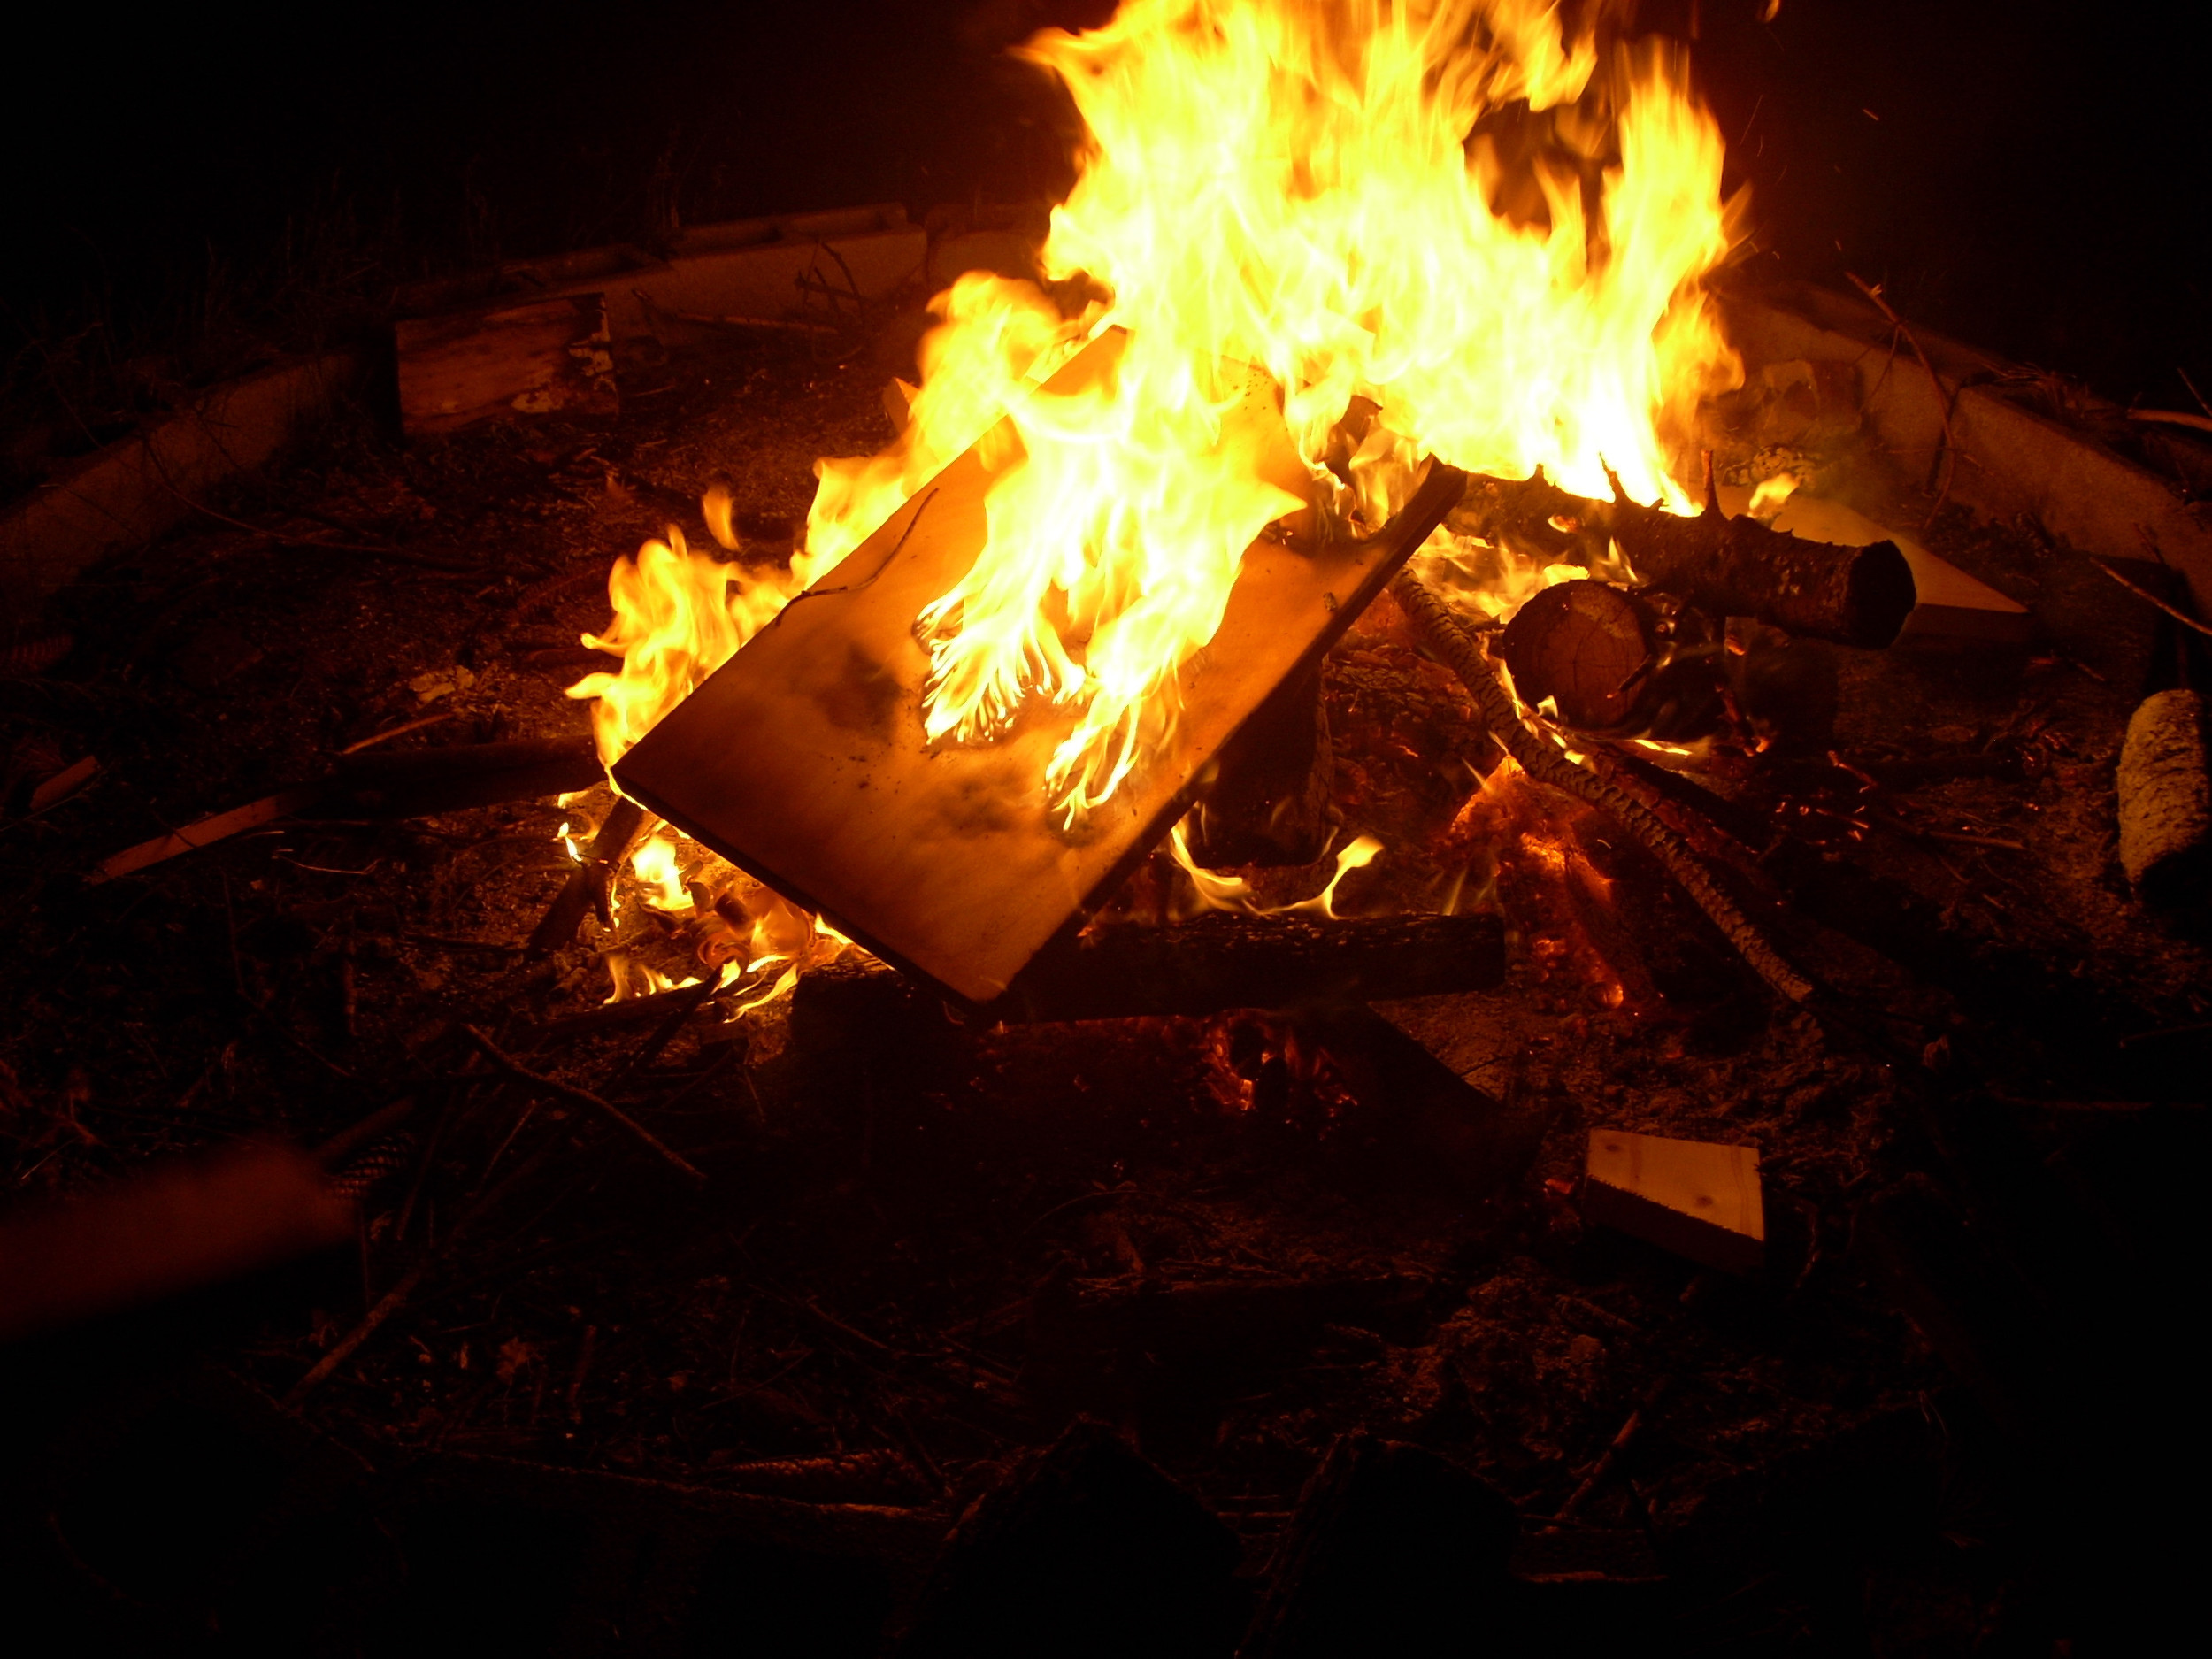 Evening Bonfire 24.JPG